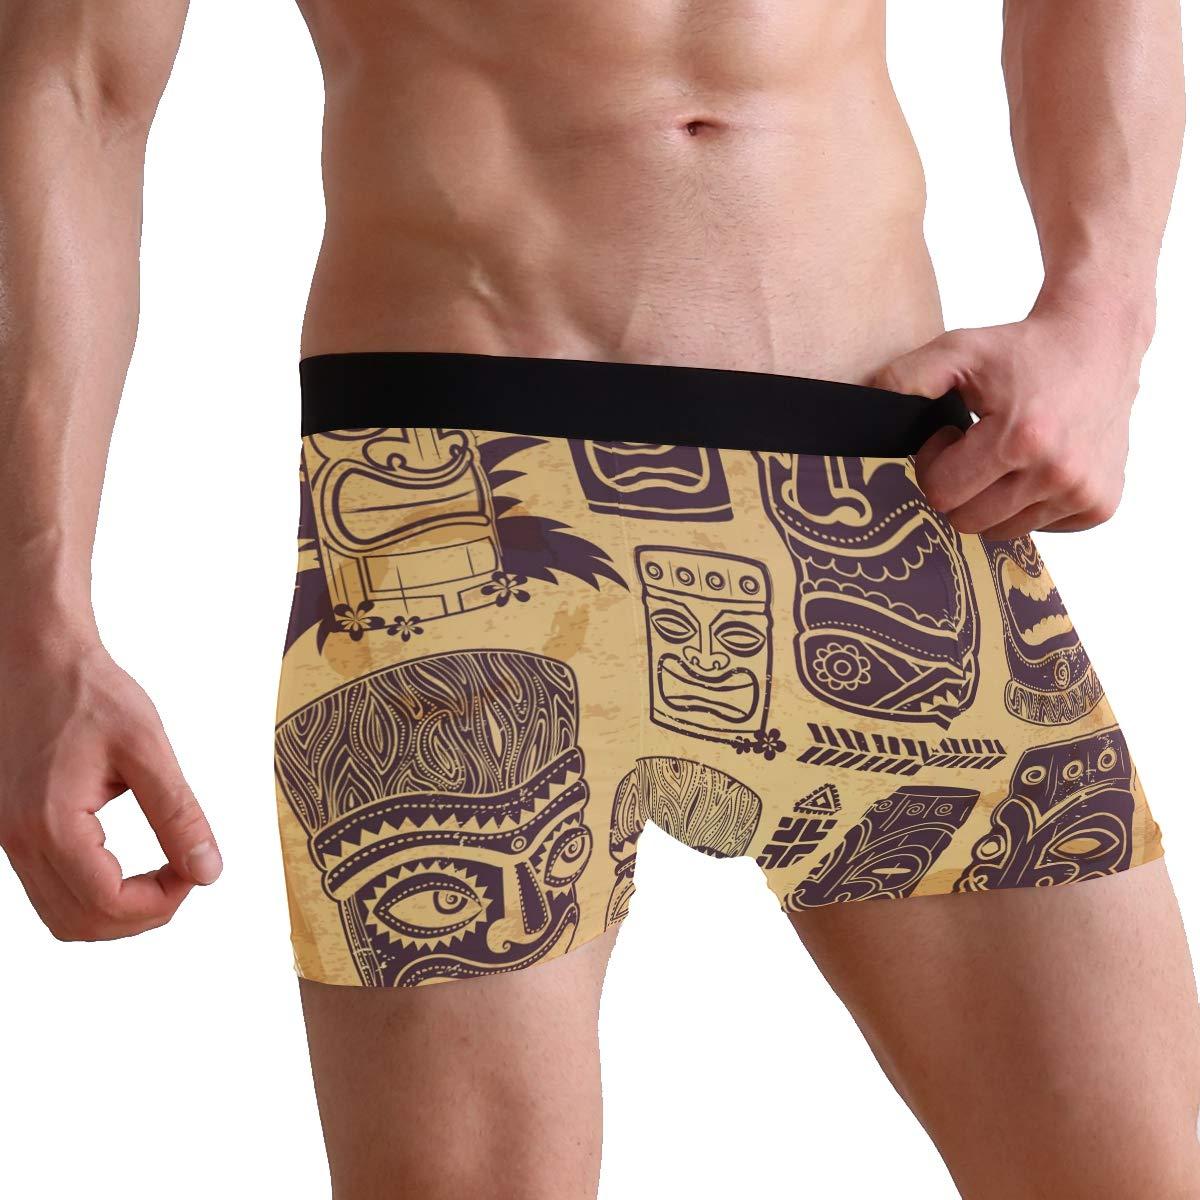 Vintage Aloha Tiki Icons Mens Underwear Soft Polyester Boxer Brief for Men Adult Teen Children Kids S